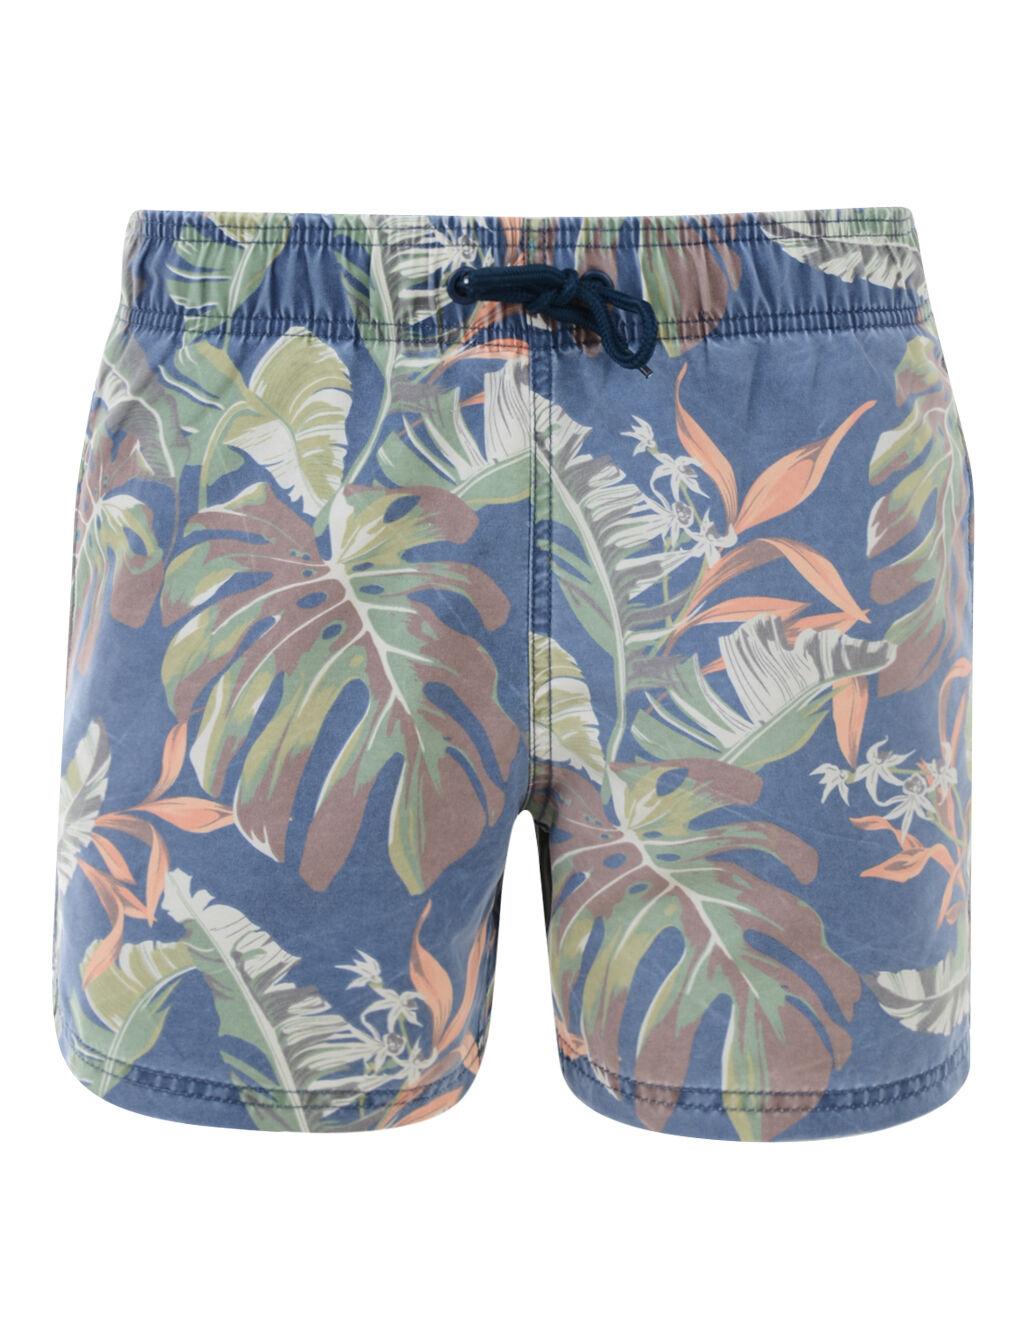 Blend New Men's Casual Floral Flower Summer Beach Swim Water Surf Shorts